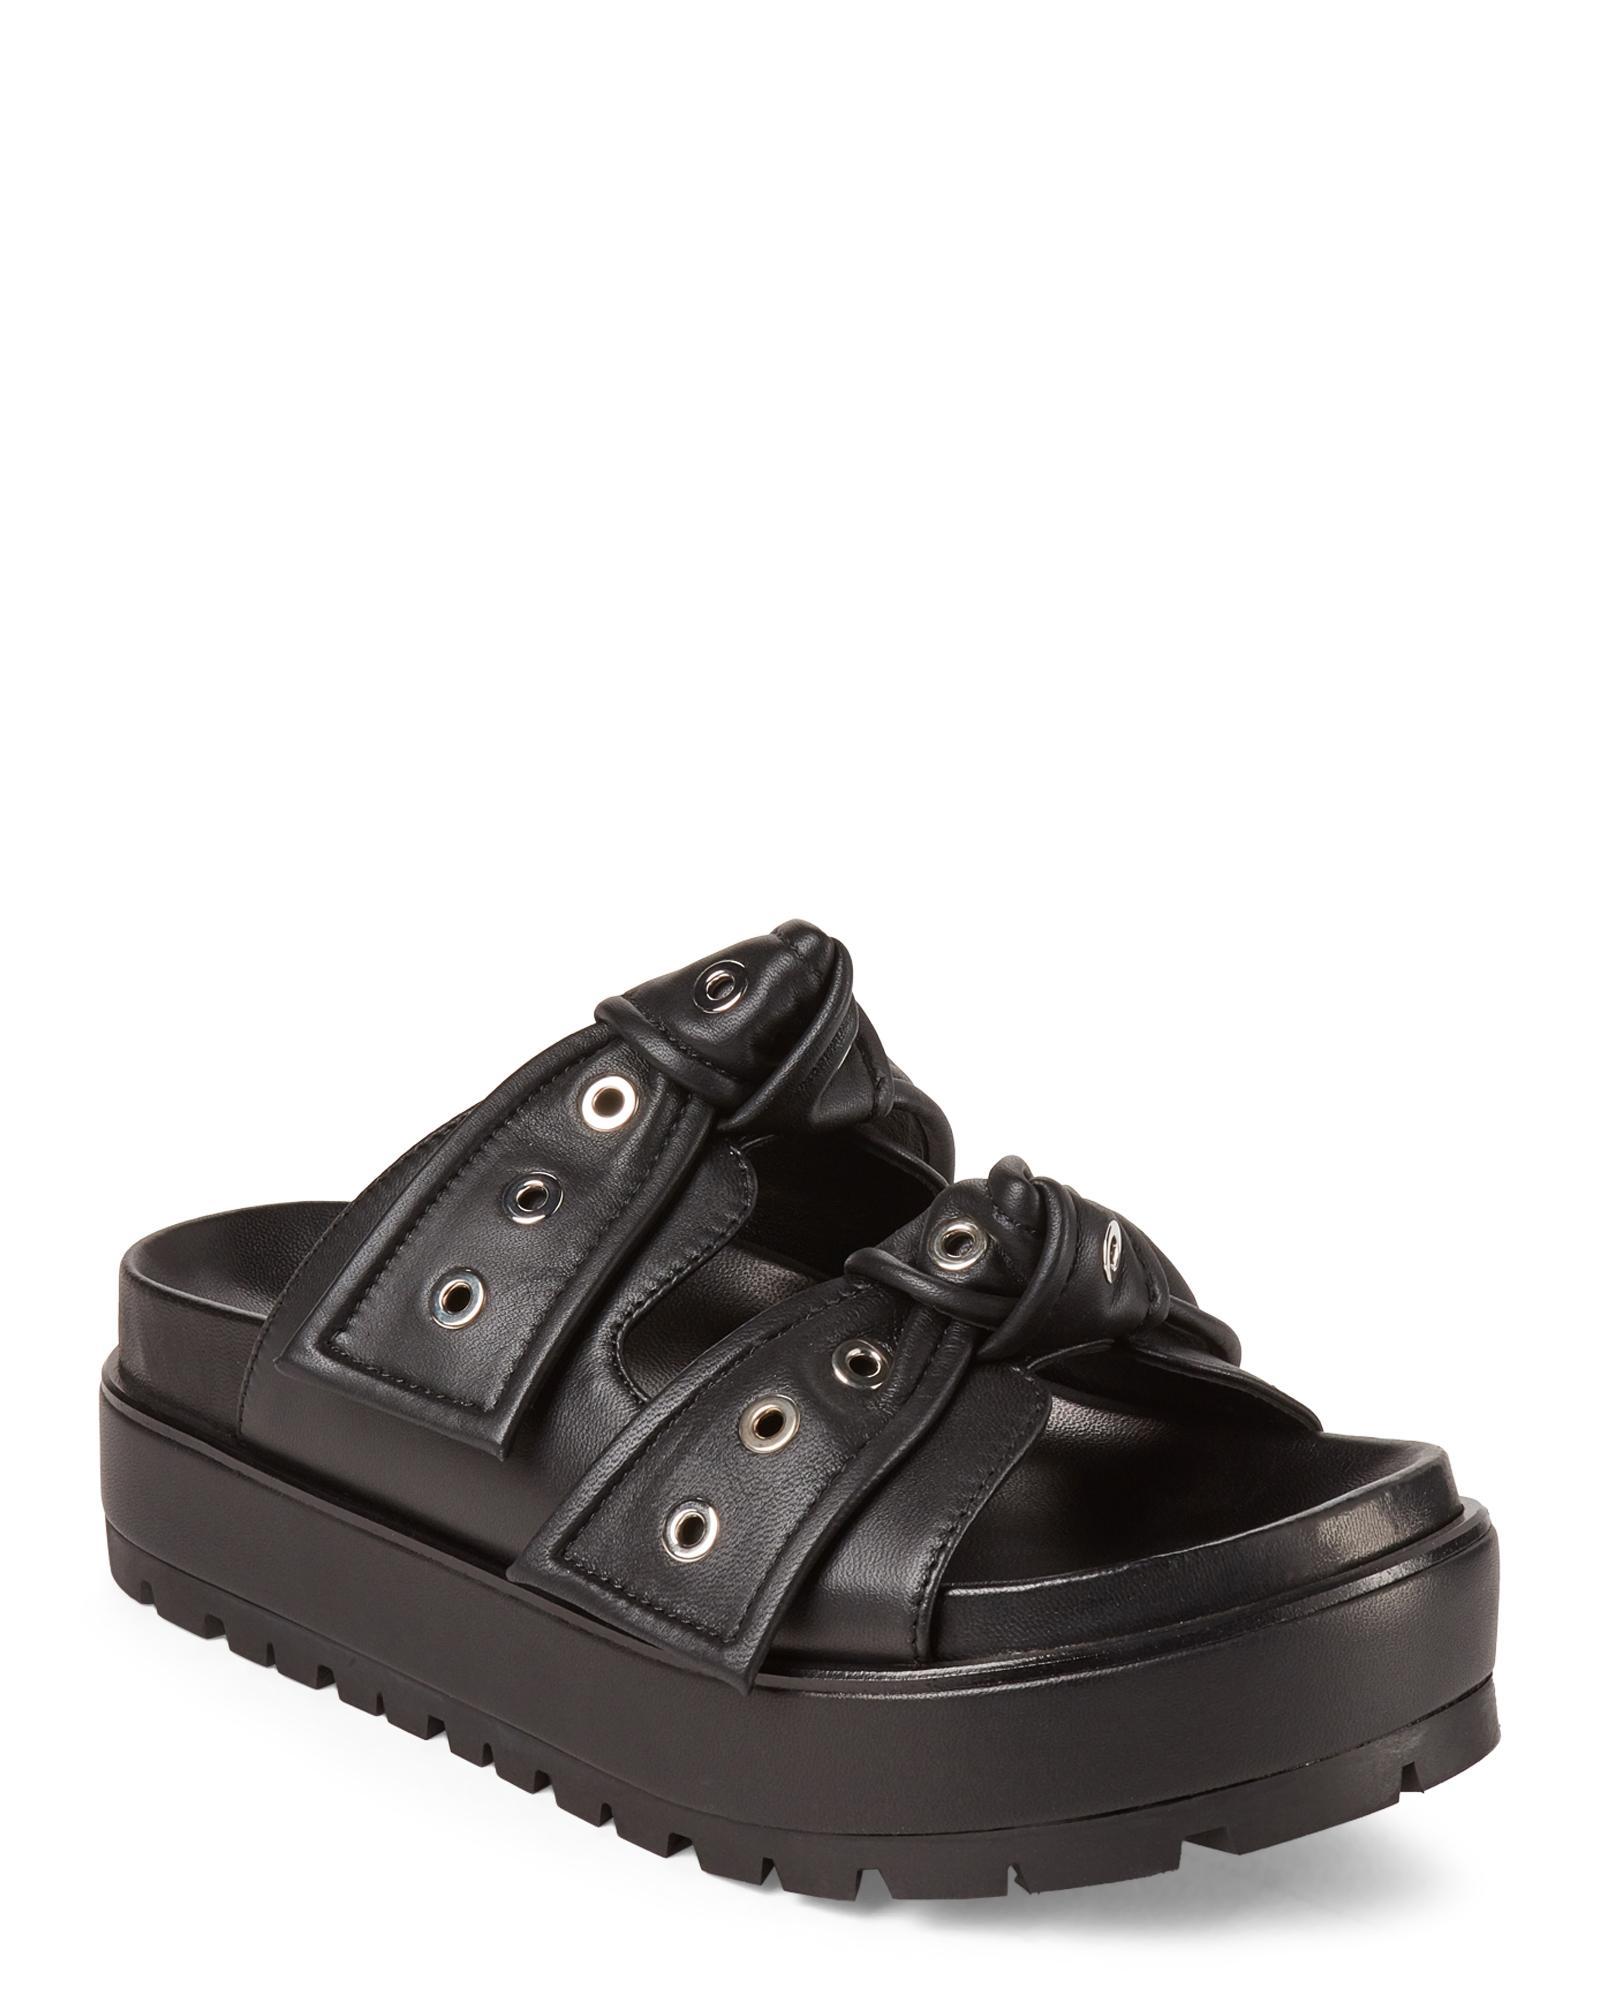 a1c81d5731c Lyst - Alexander McQueen Black Platform Leather Slide Sandals in Black